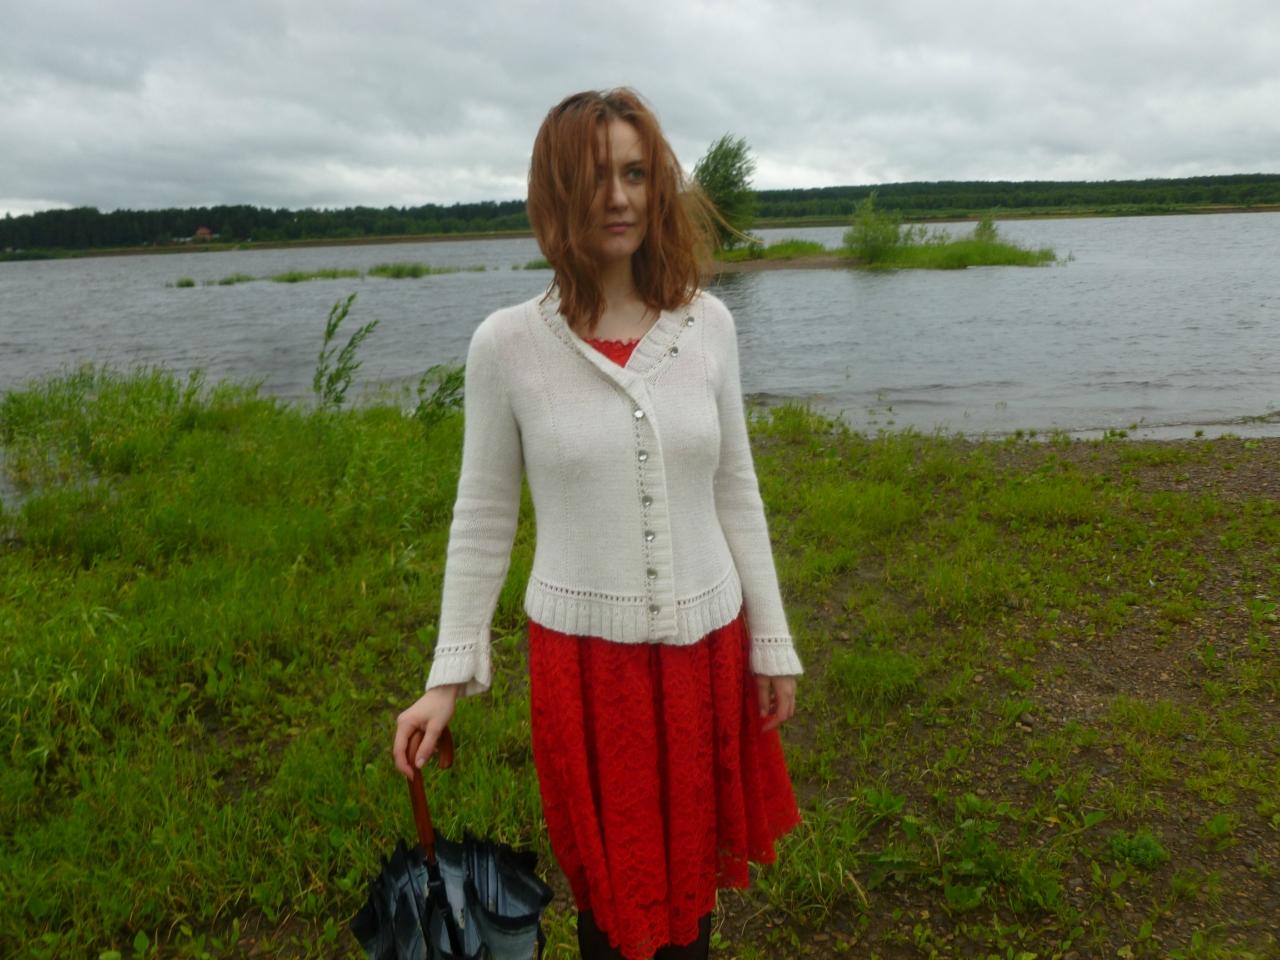 Maroosya red dress